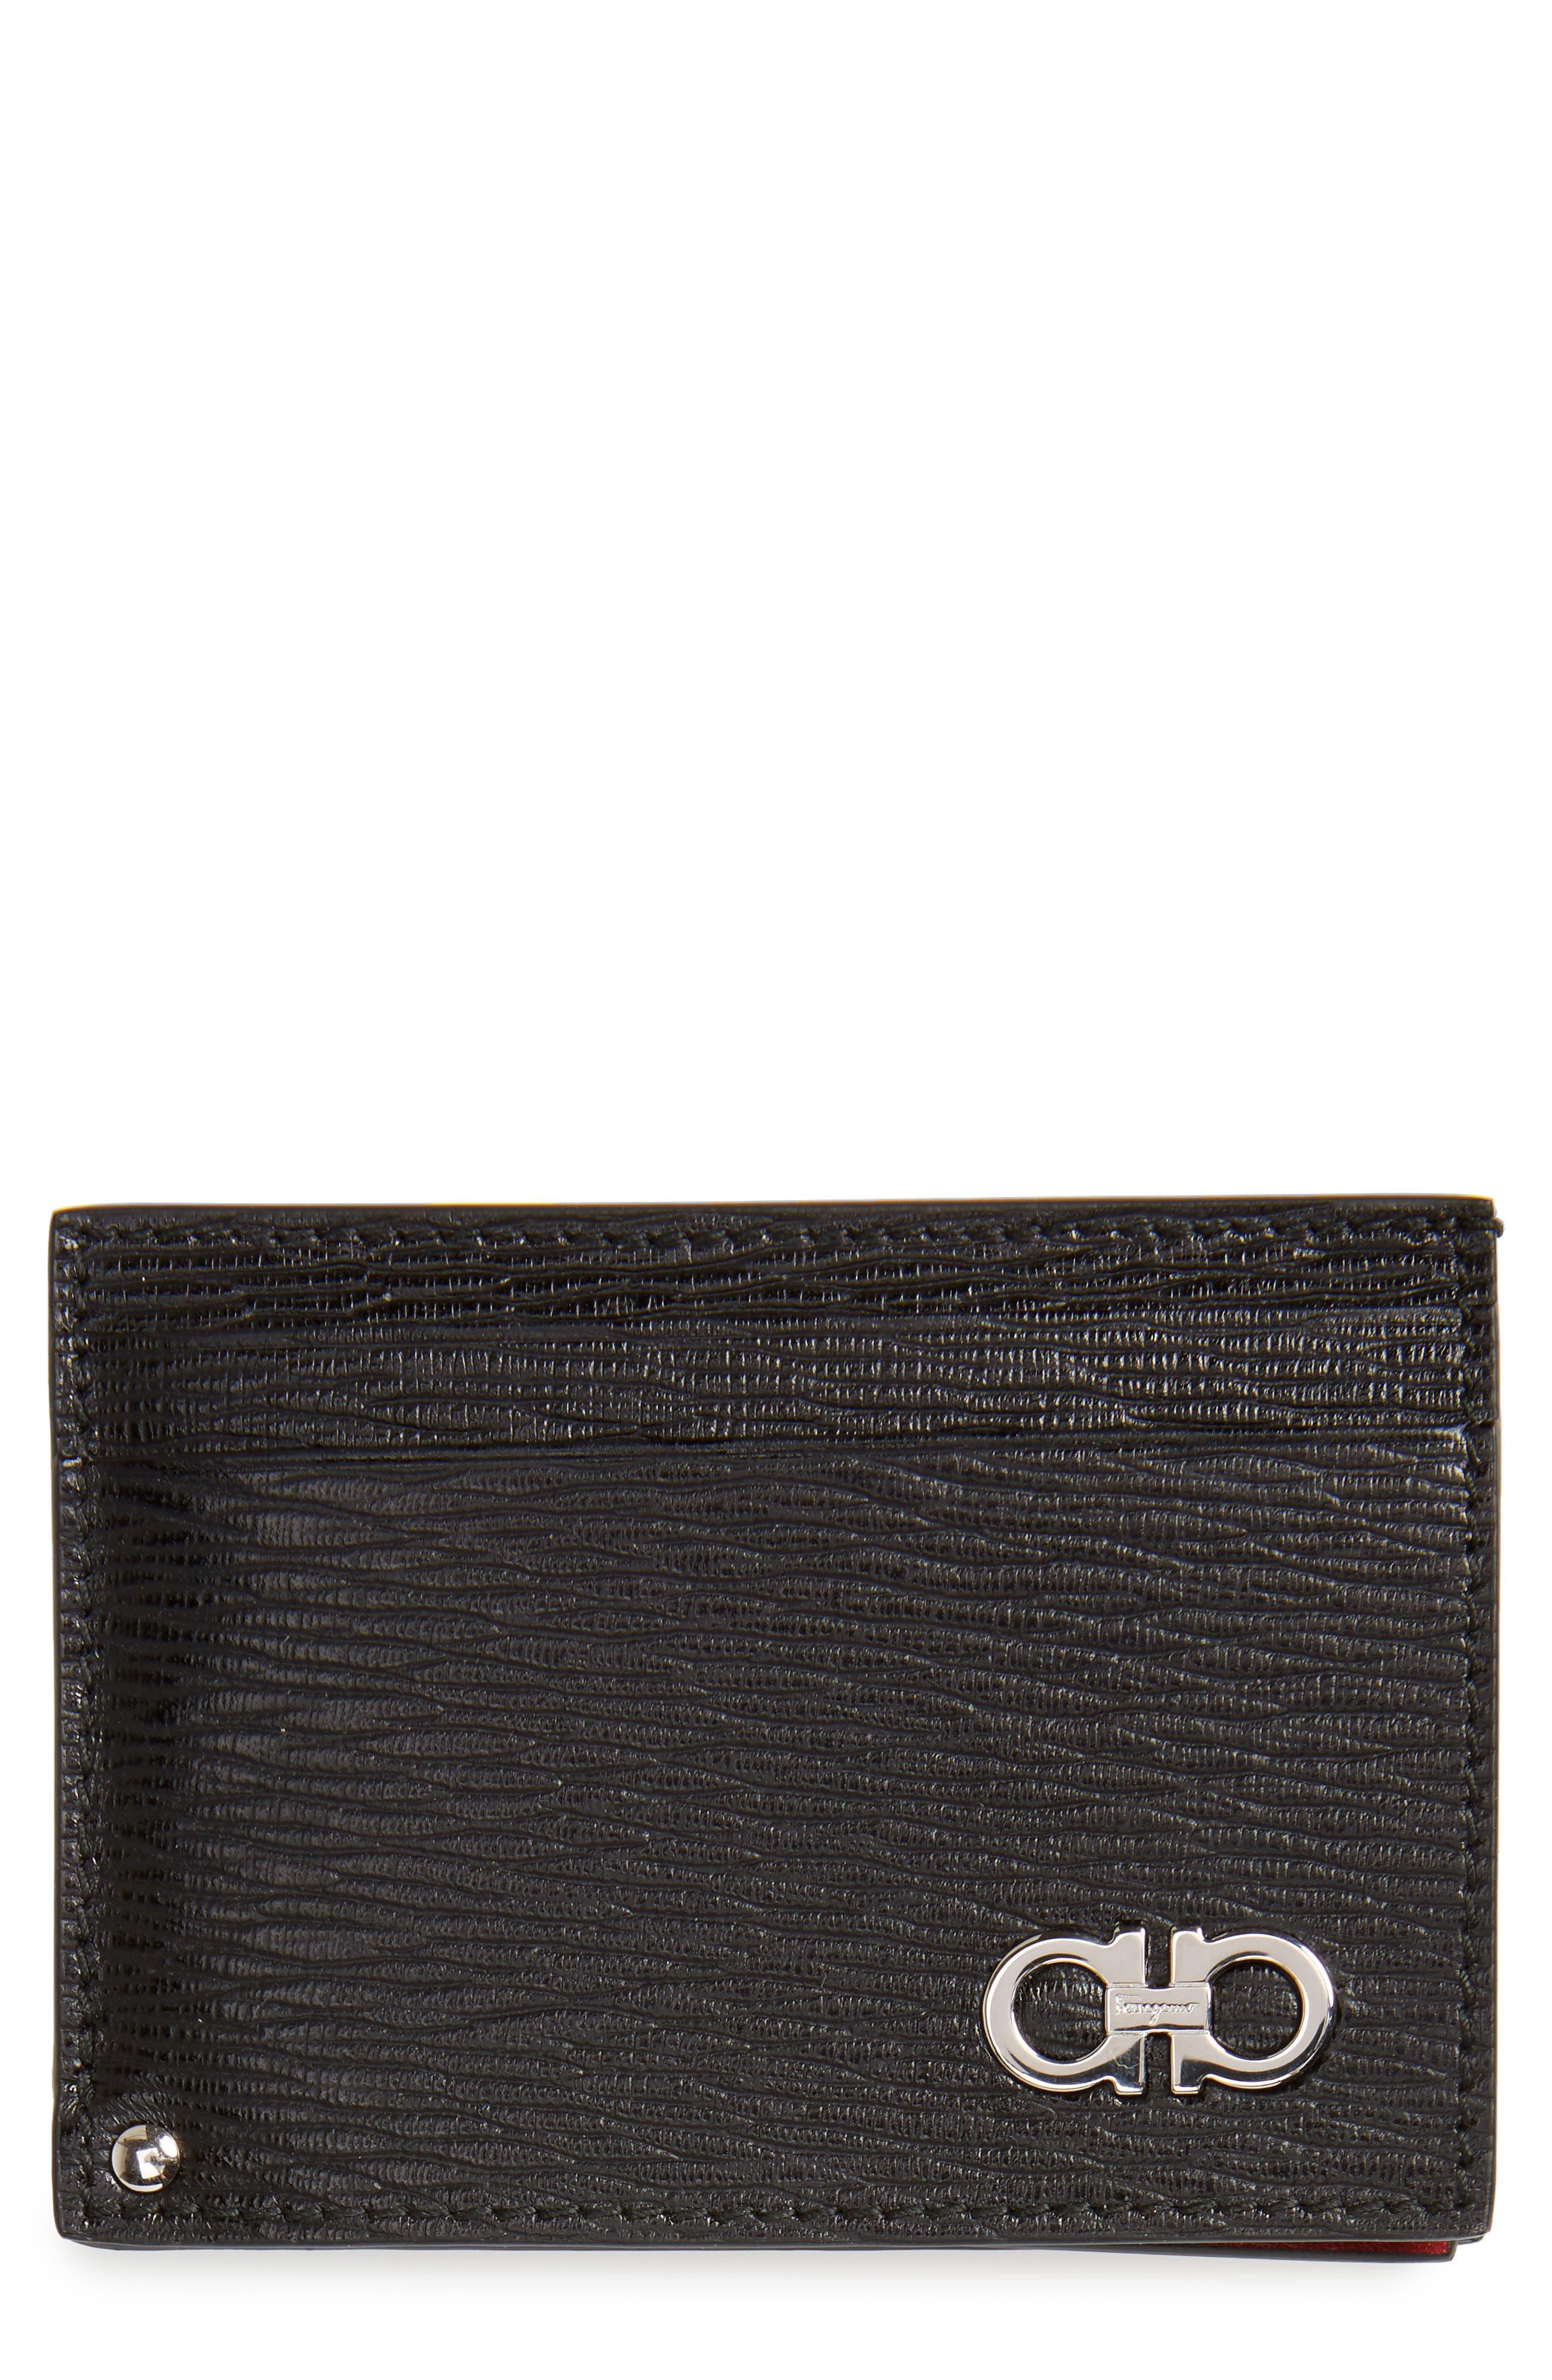 Revival Calfskin Leather Card Case,                         Main,                         color, Black